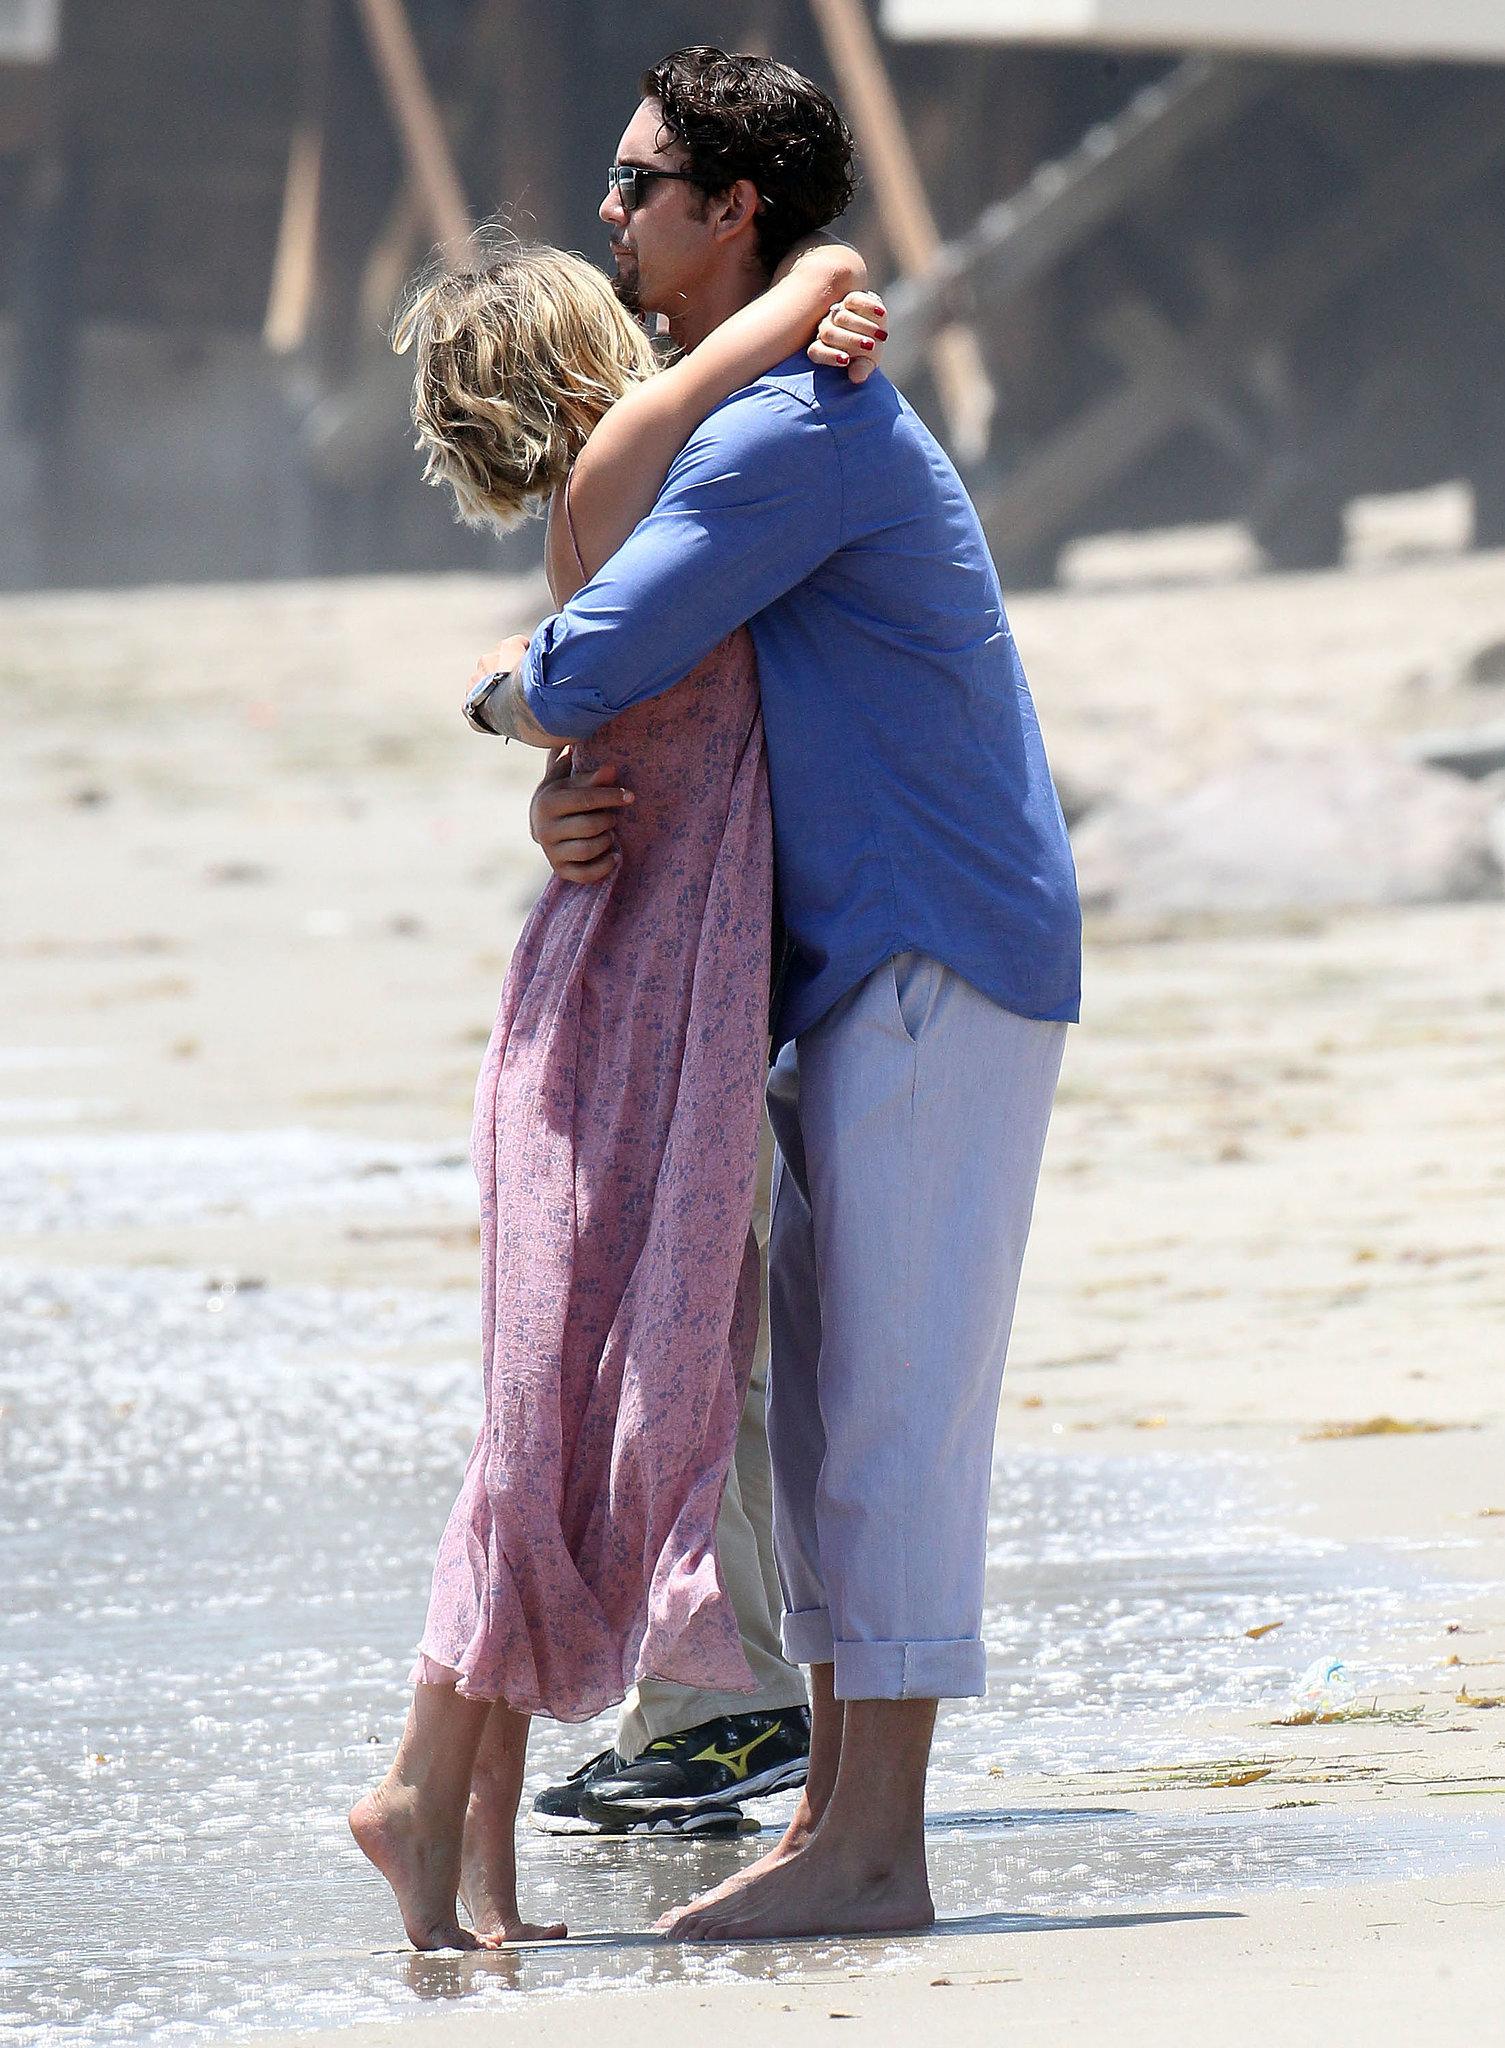 Kaley Cuoco and Ryan Sweeting showed PDA on the beach.